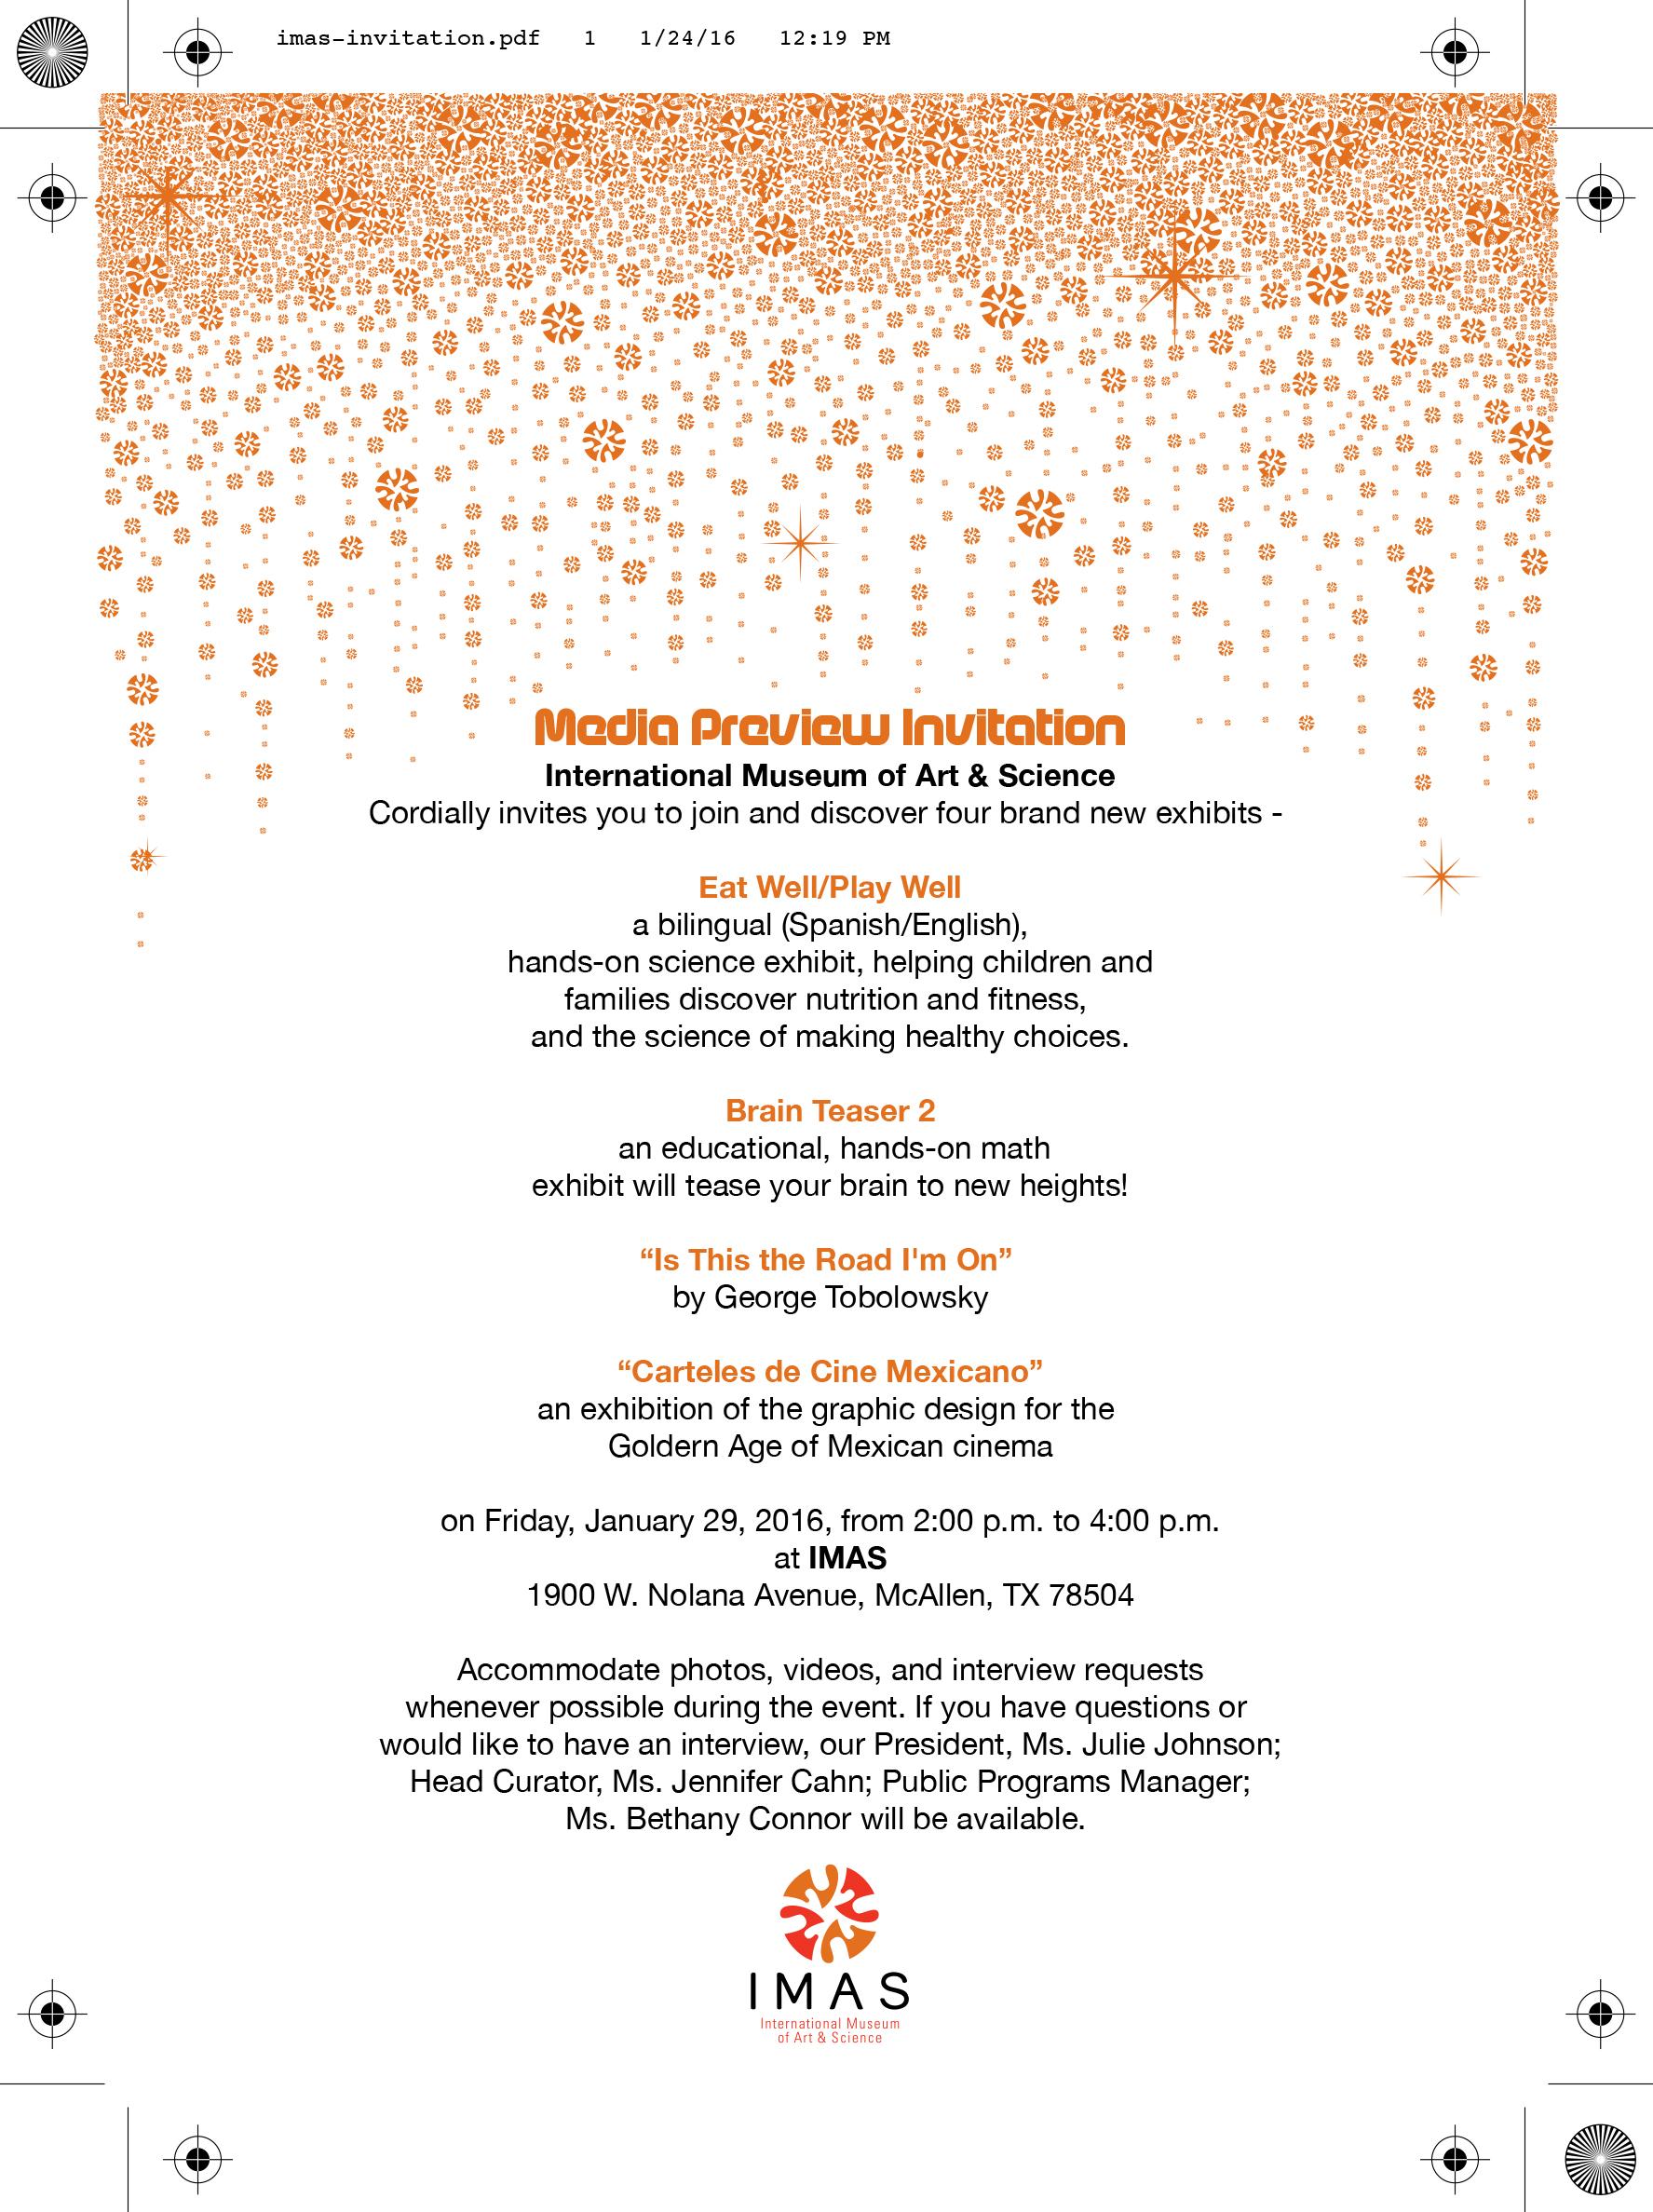 imas-invitation